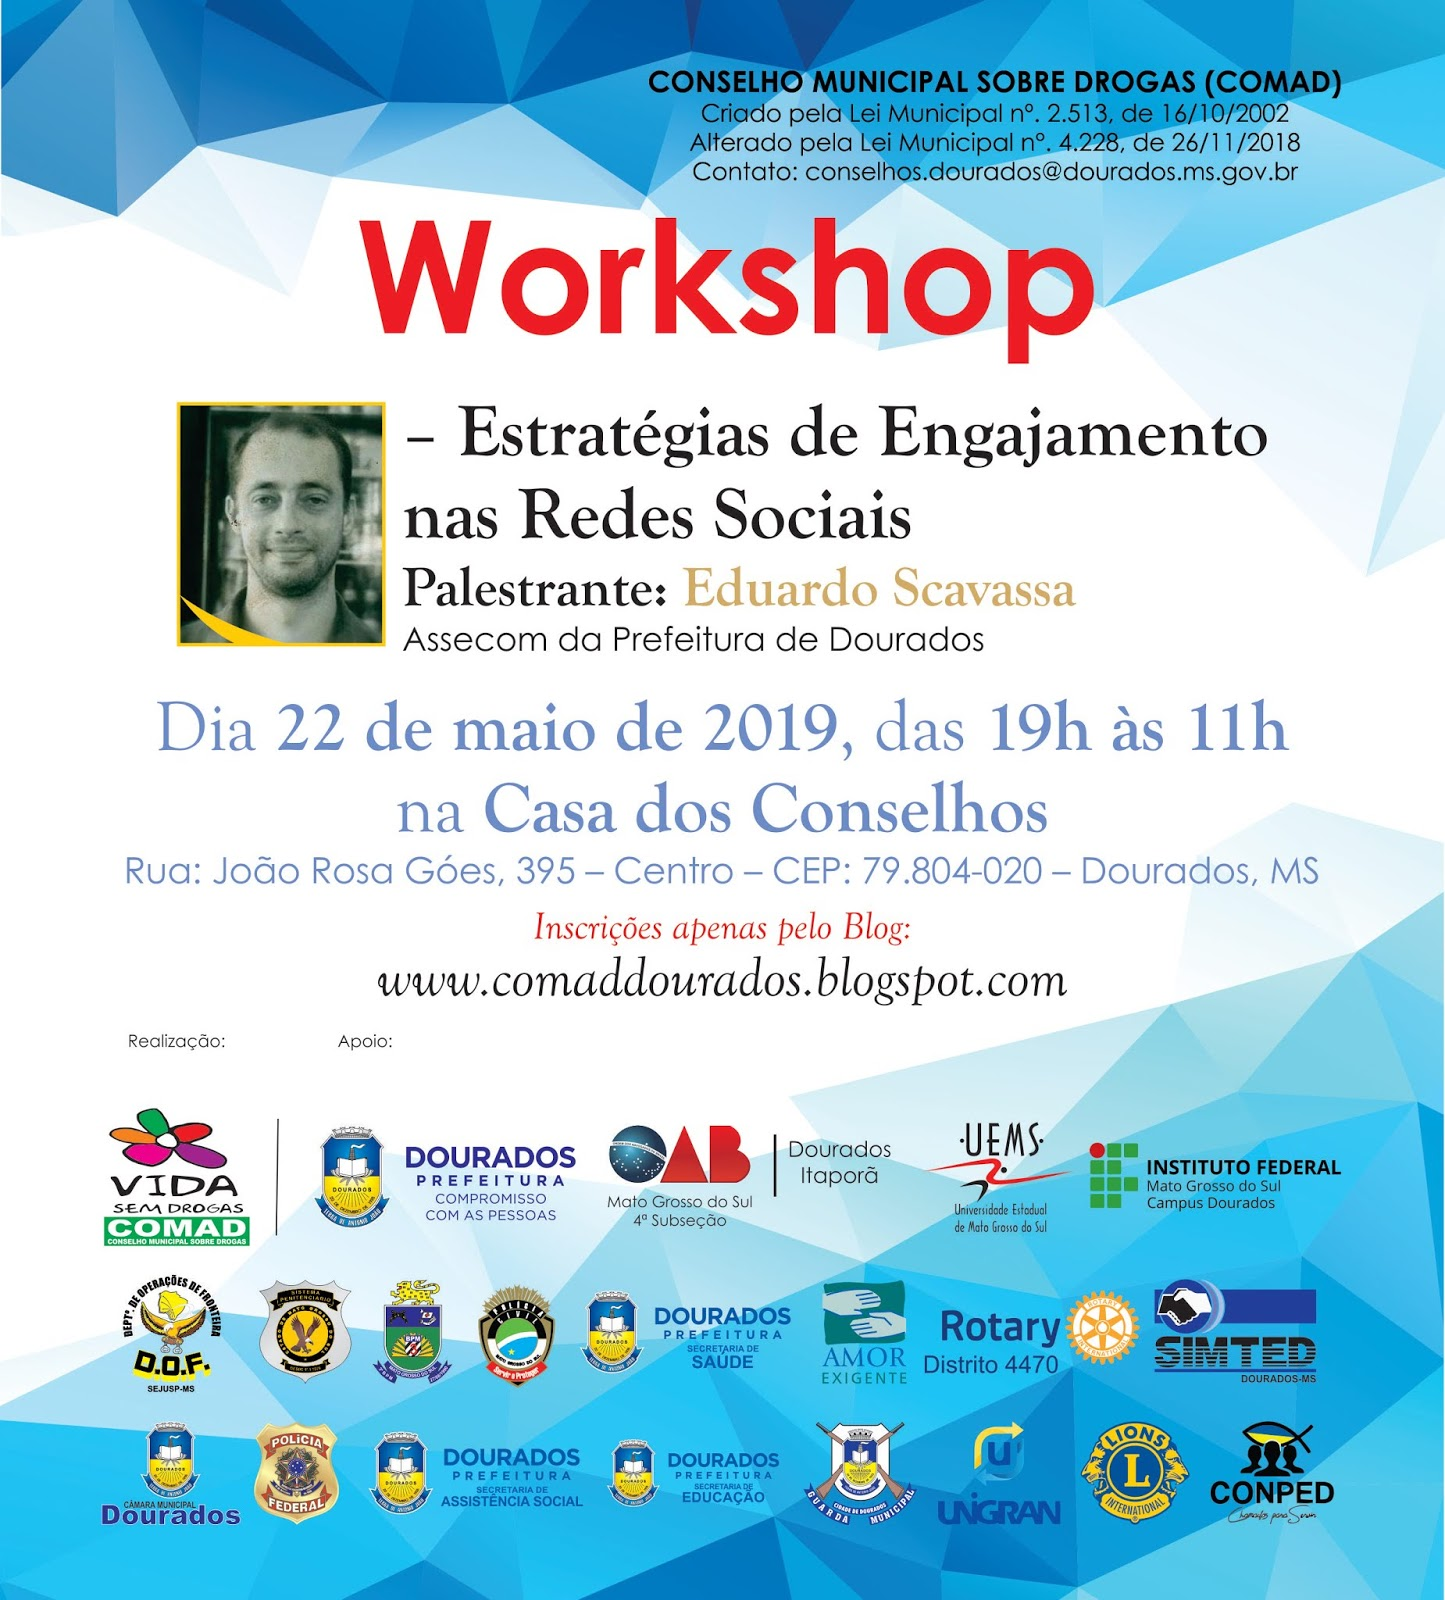 Workshop sobre Redes Sociais